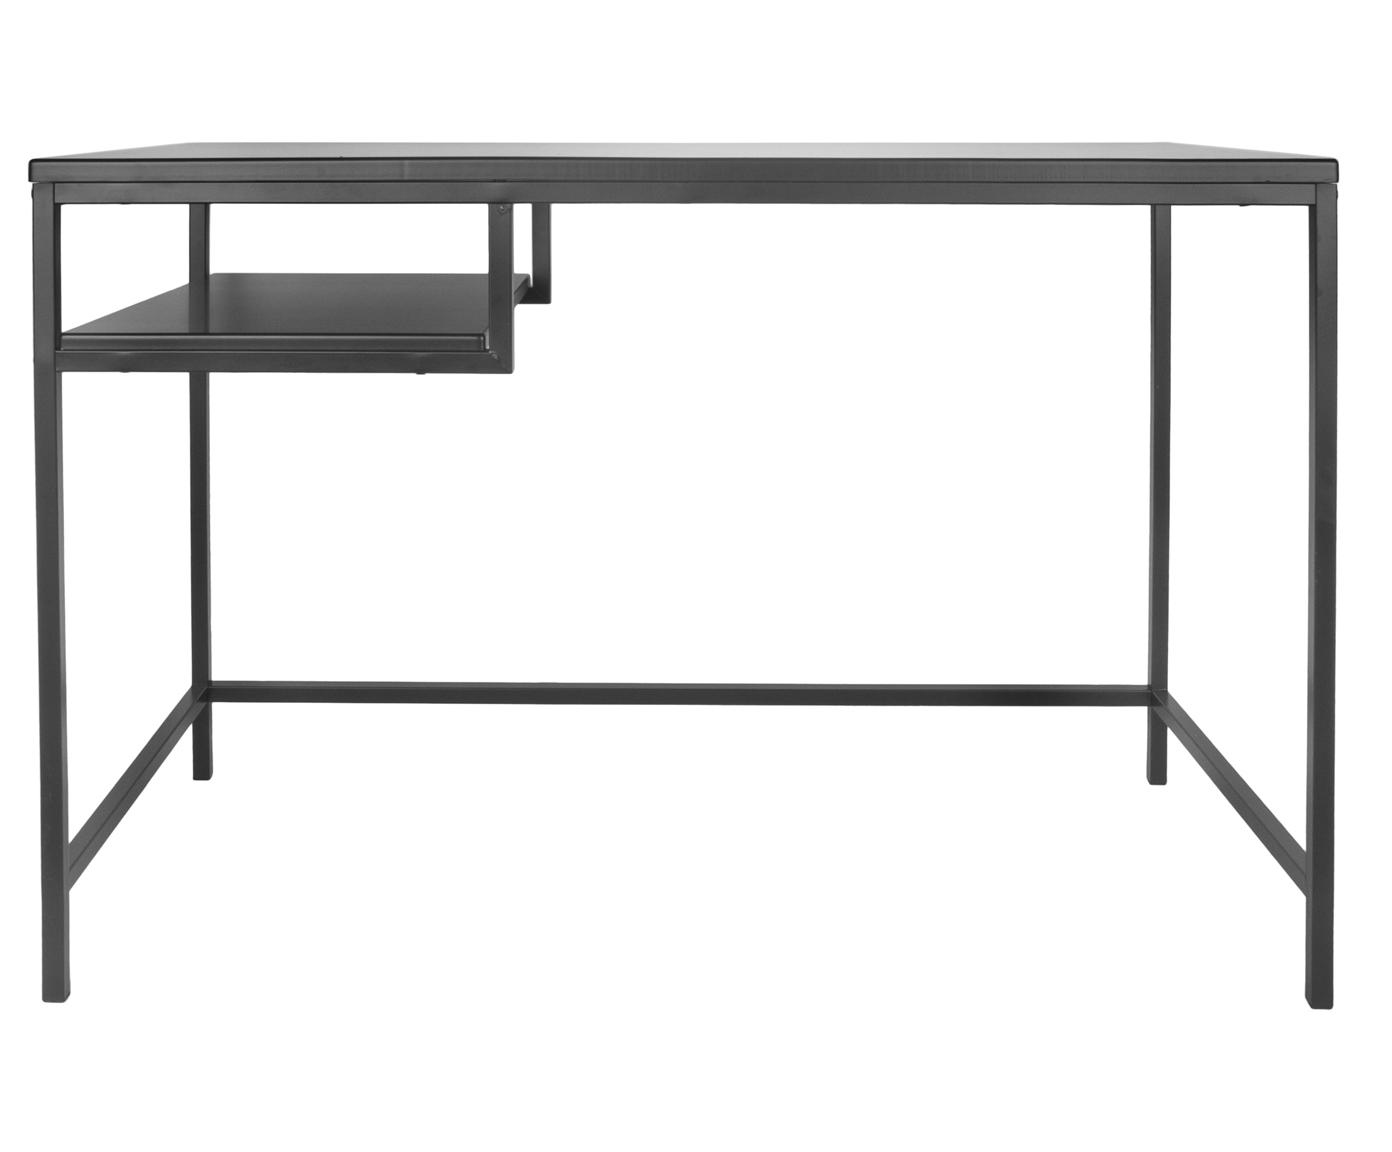 Escritorio Fushion, Estructura: metal con pintura en polv, Negro, An 114 x Al 76 cm